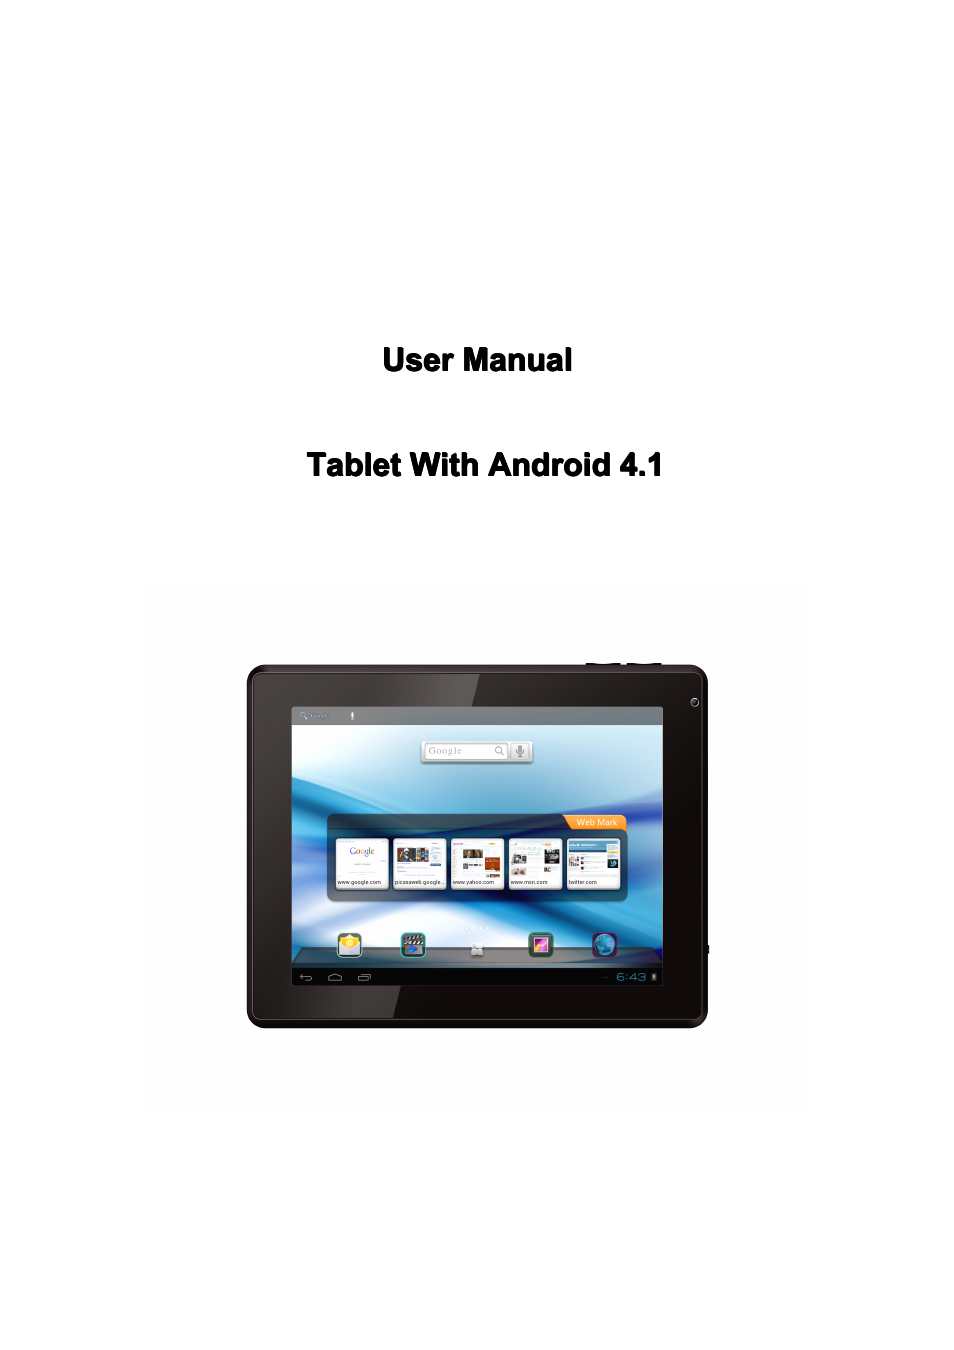 pipo s2 user manual 18 pages rh manualsdir com Android Manual Smartphone Motorola Droid 2 User Guide